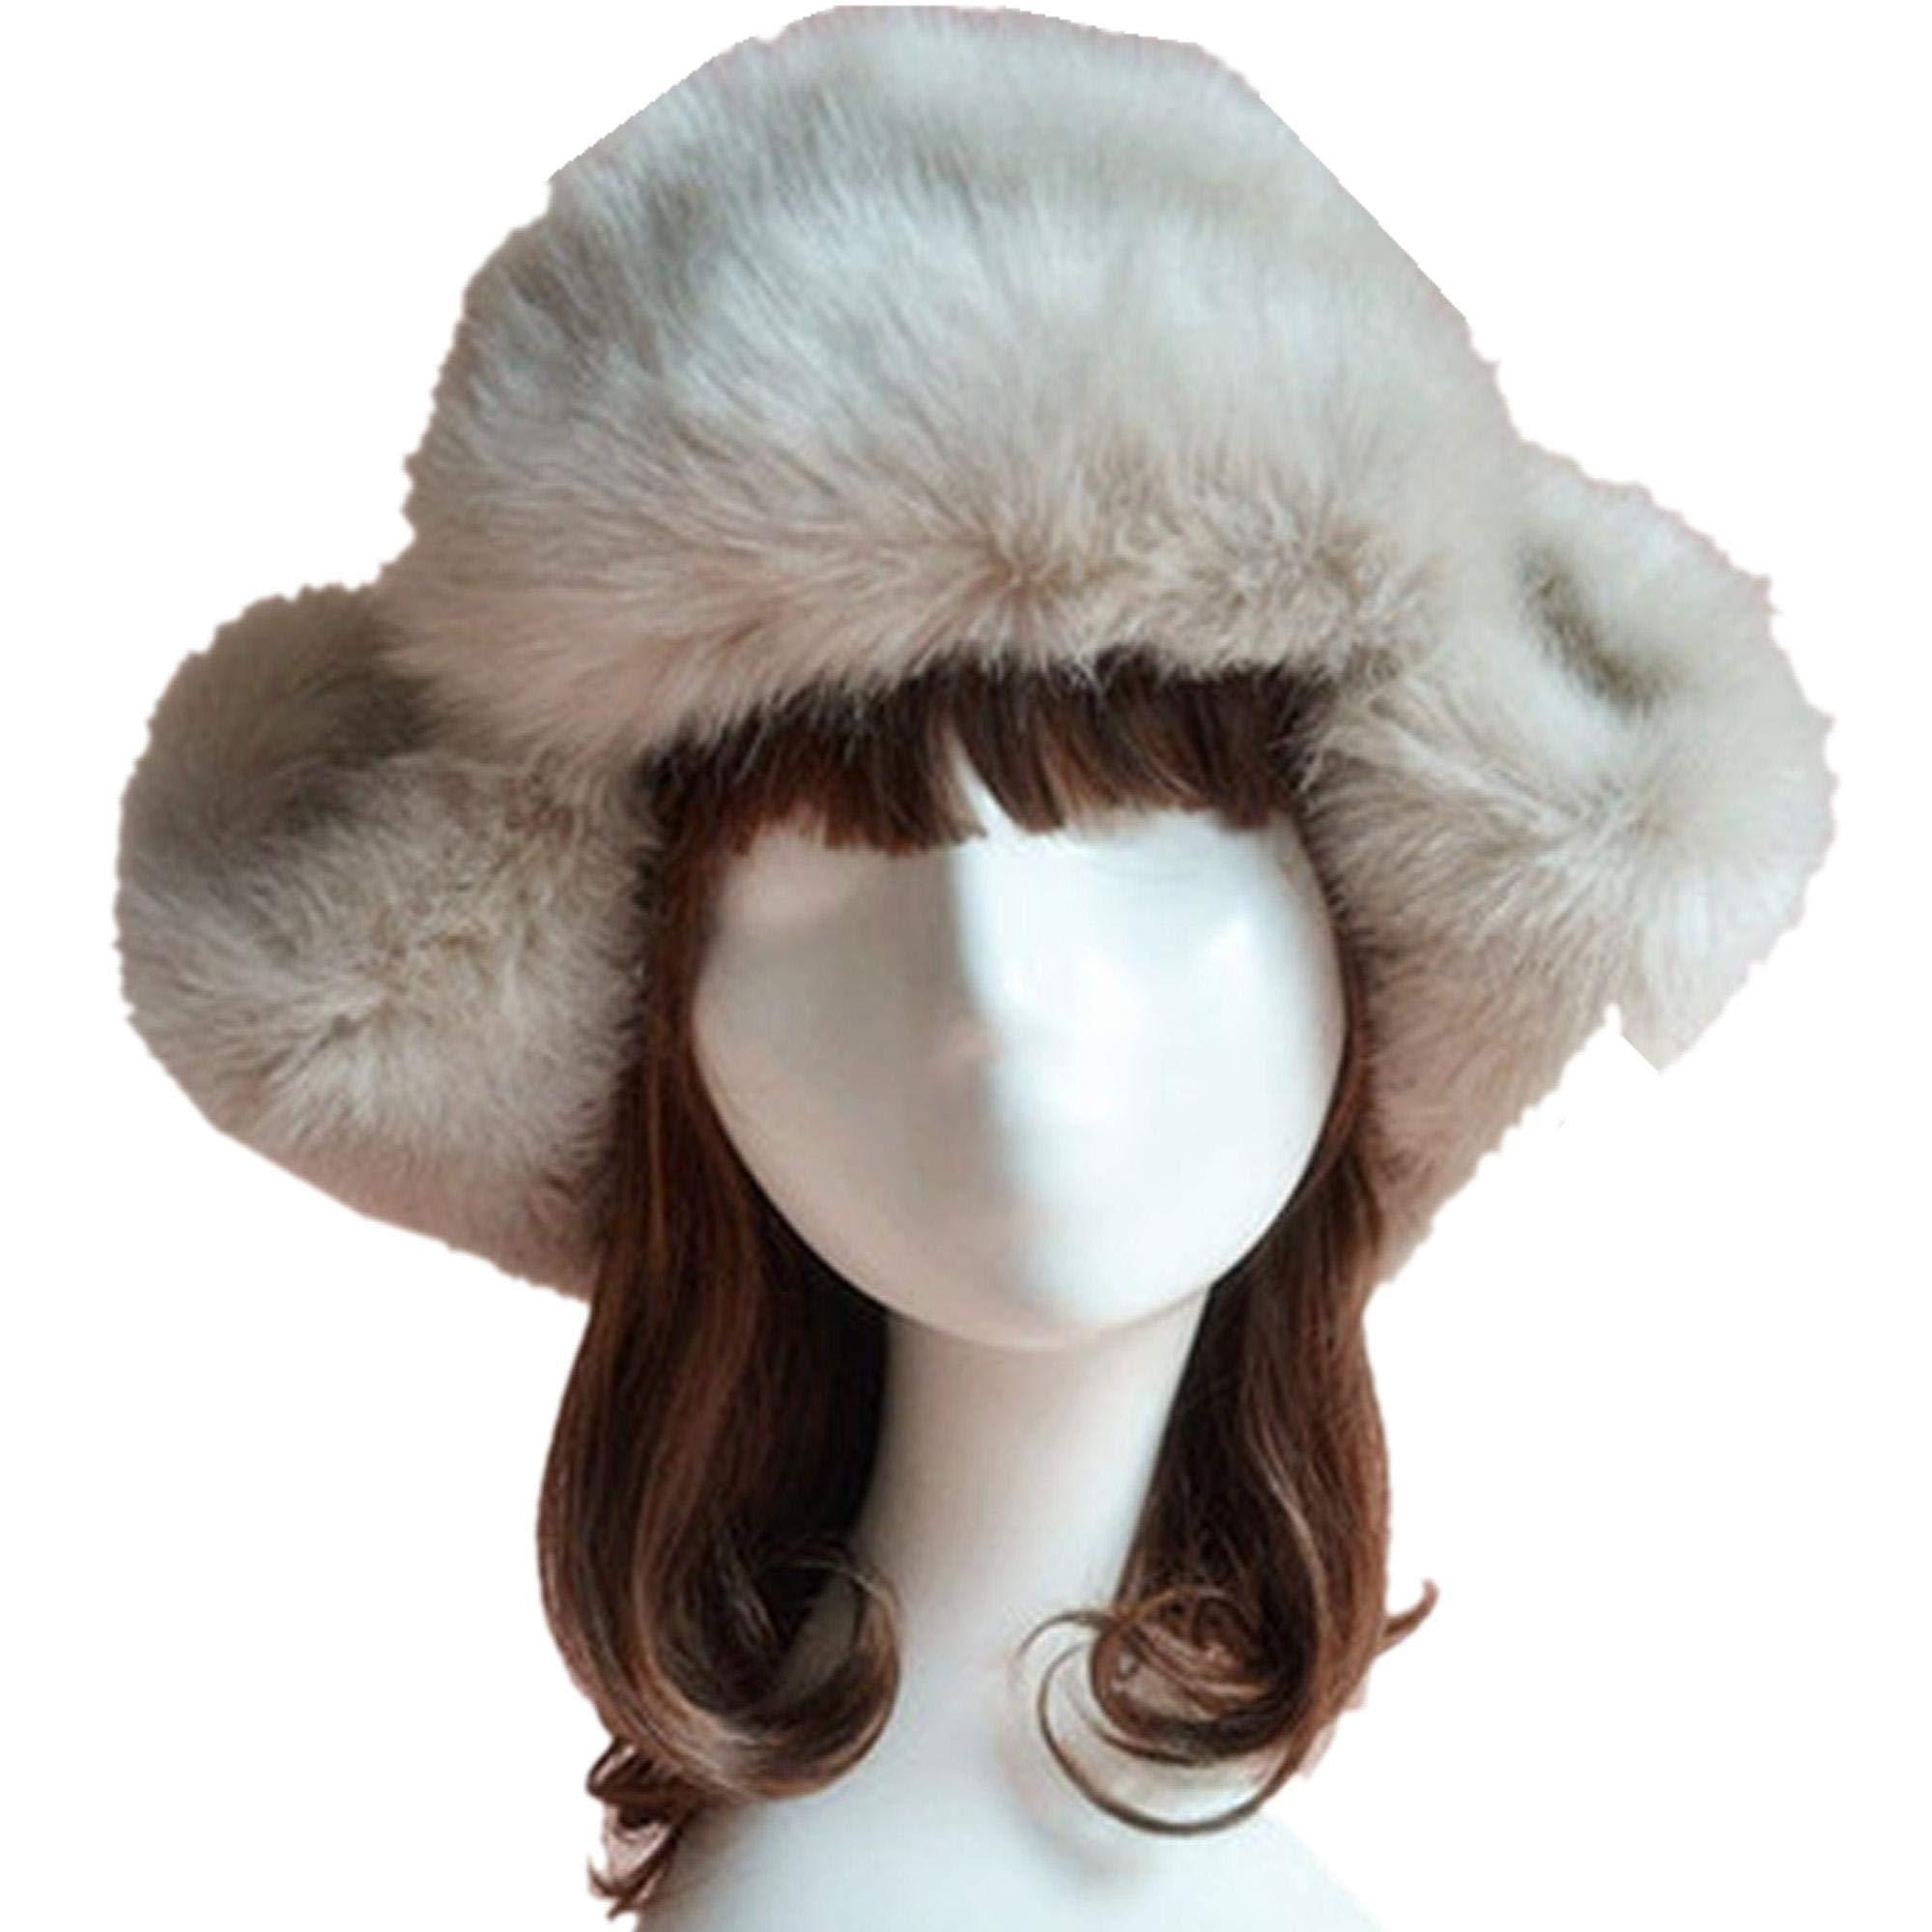 Esqlotres Fashion New Faux Fur Hat Cap For Winter Fuzzy Cap Cold Weather Headbands